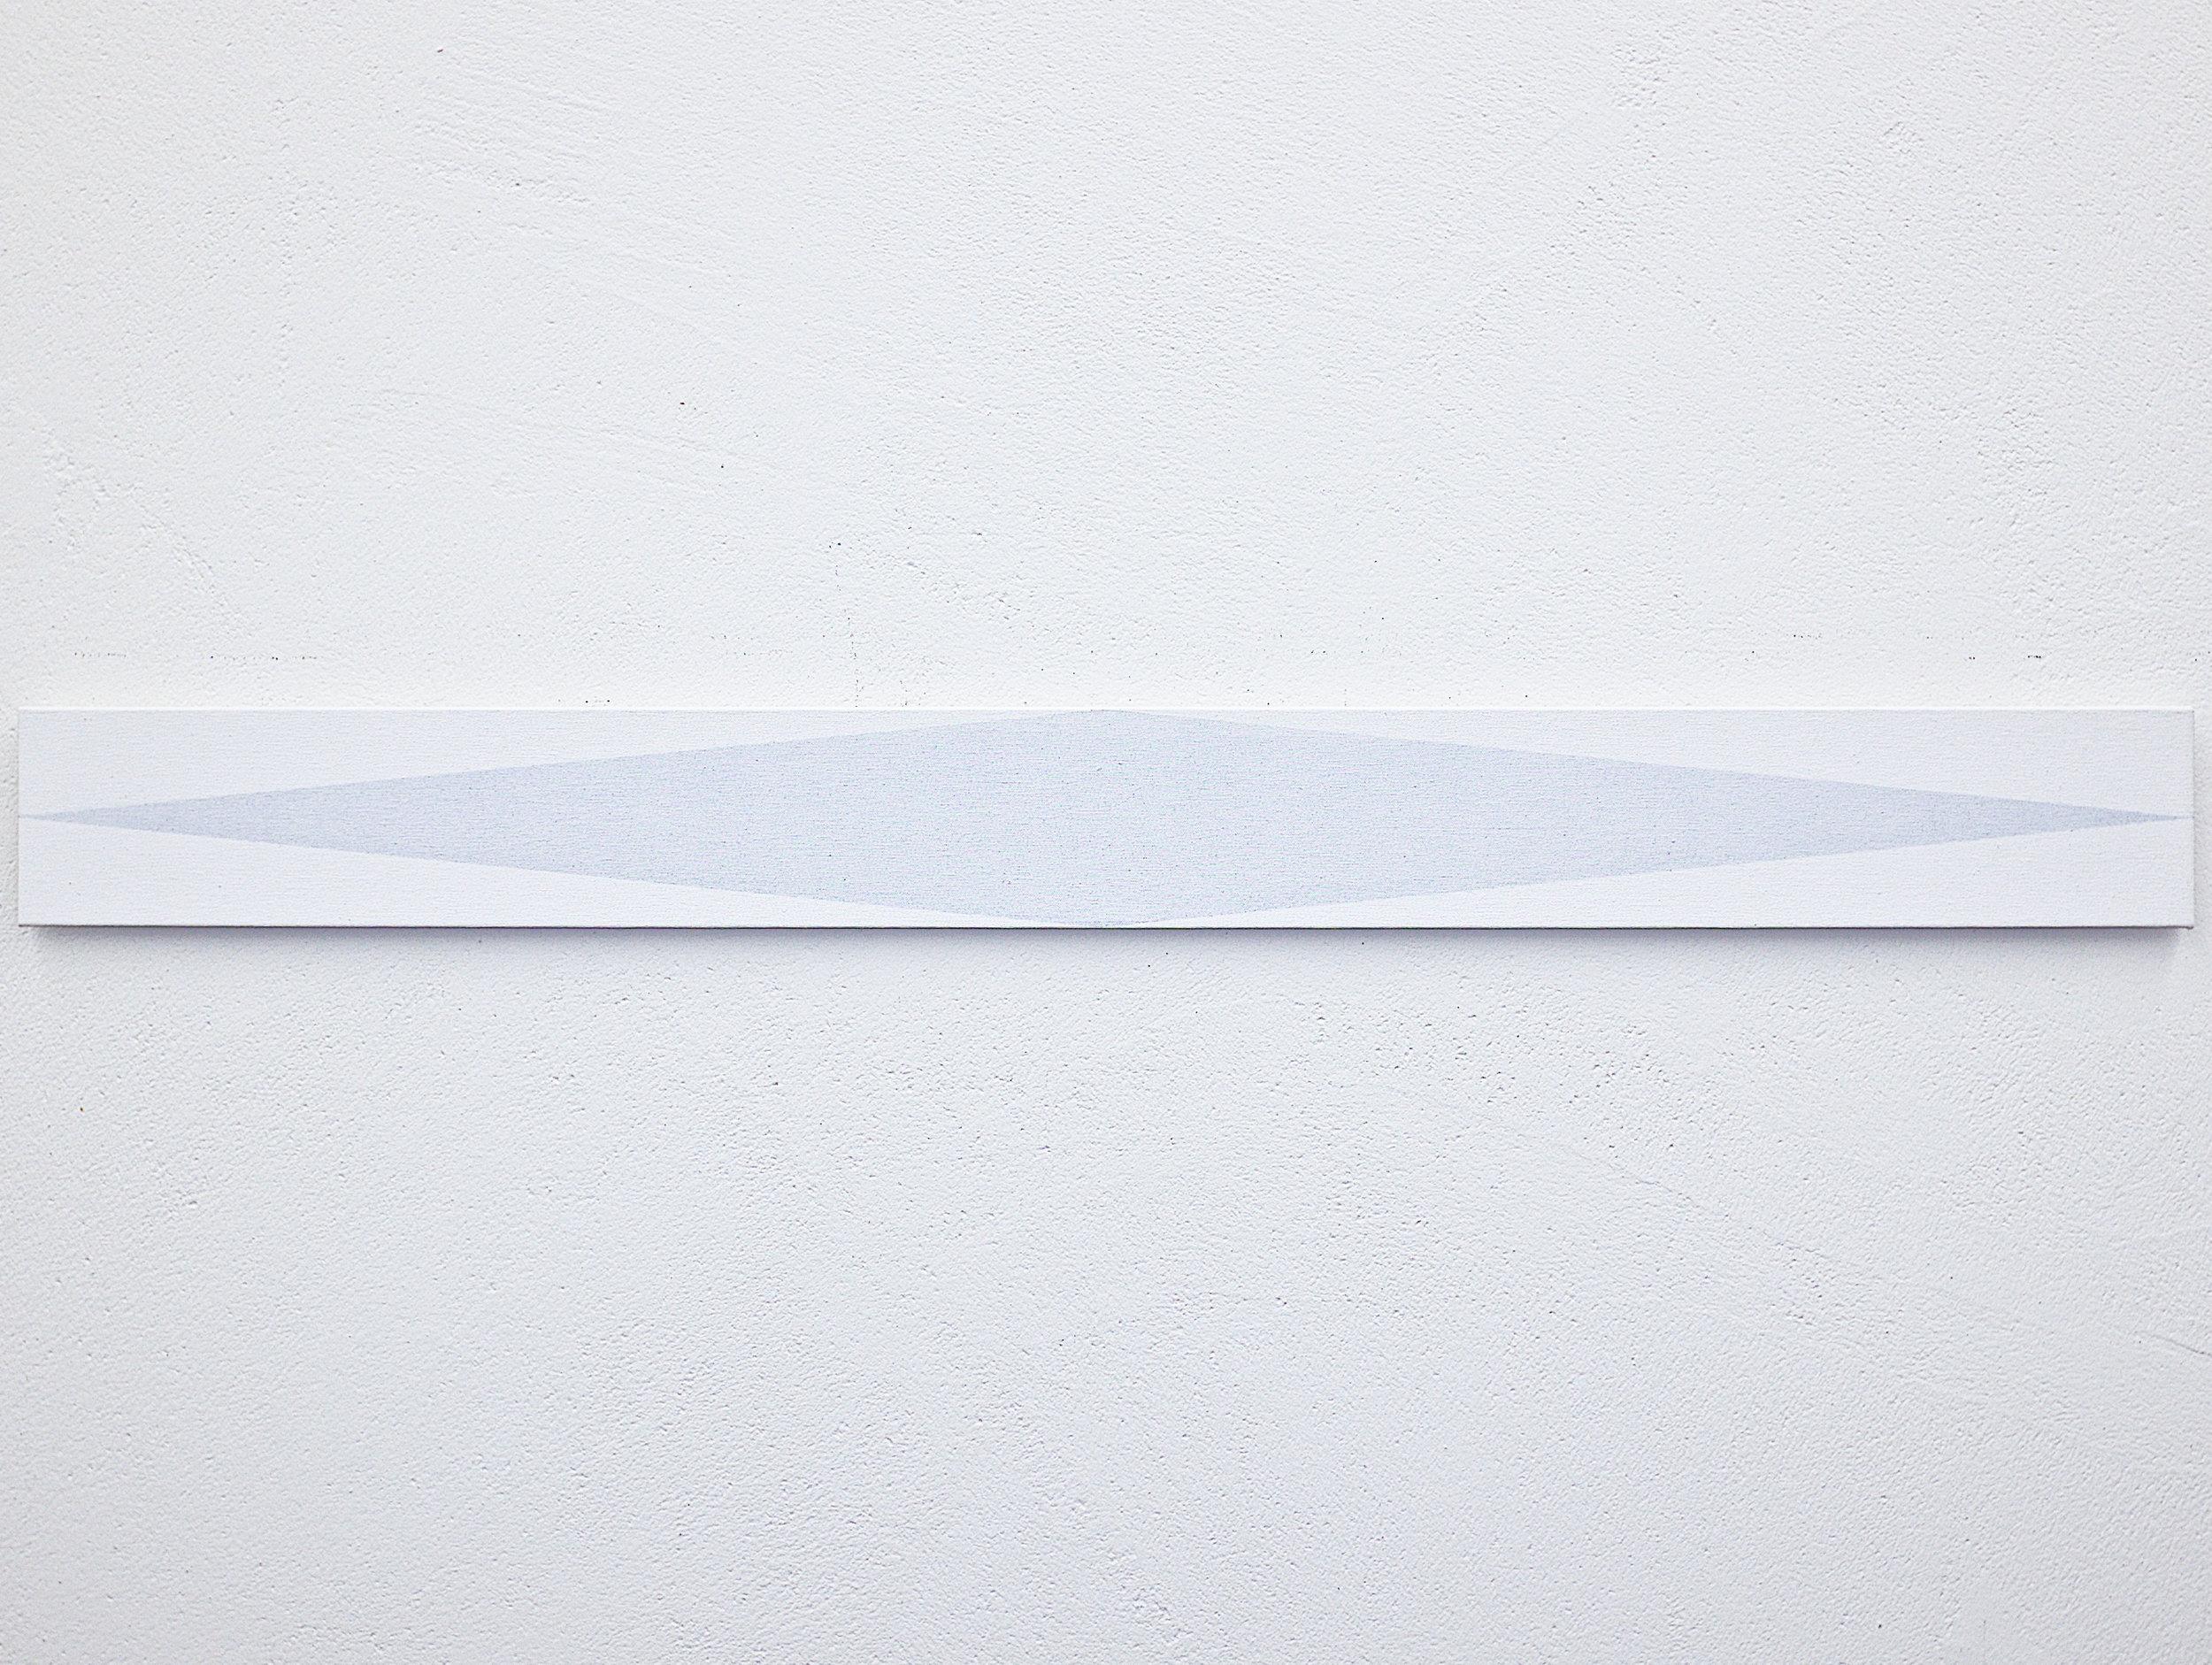 bild nr. 01.4/2017 - 10 x 100cm - acryl auf baumwolle/alu